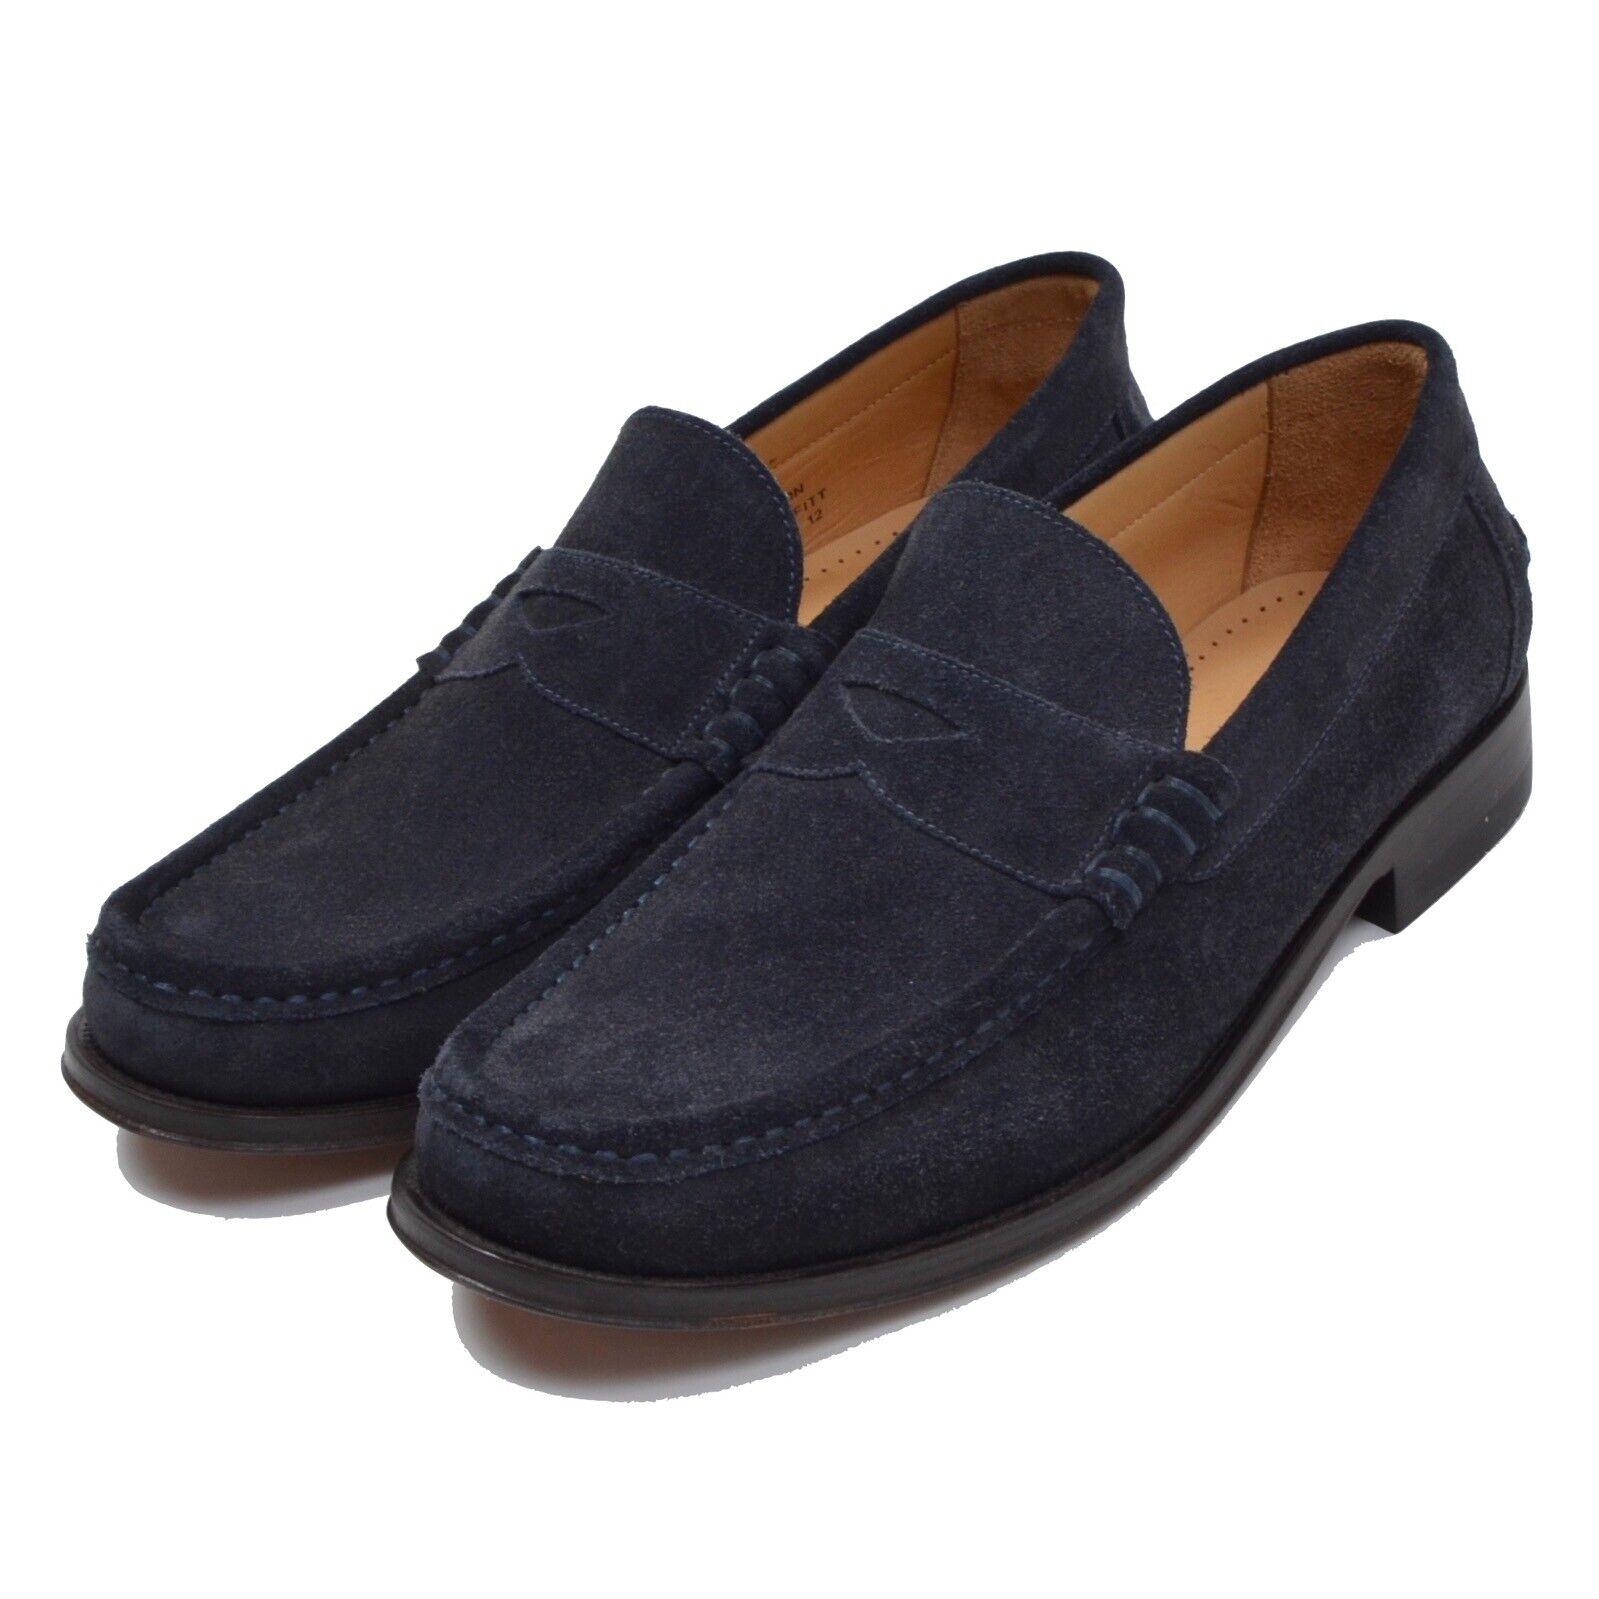 NEU Loake Lifestyle Mocassin Loafer Gr 6 F Wildleder Suede Marineblau Navy Blau